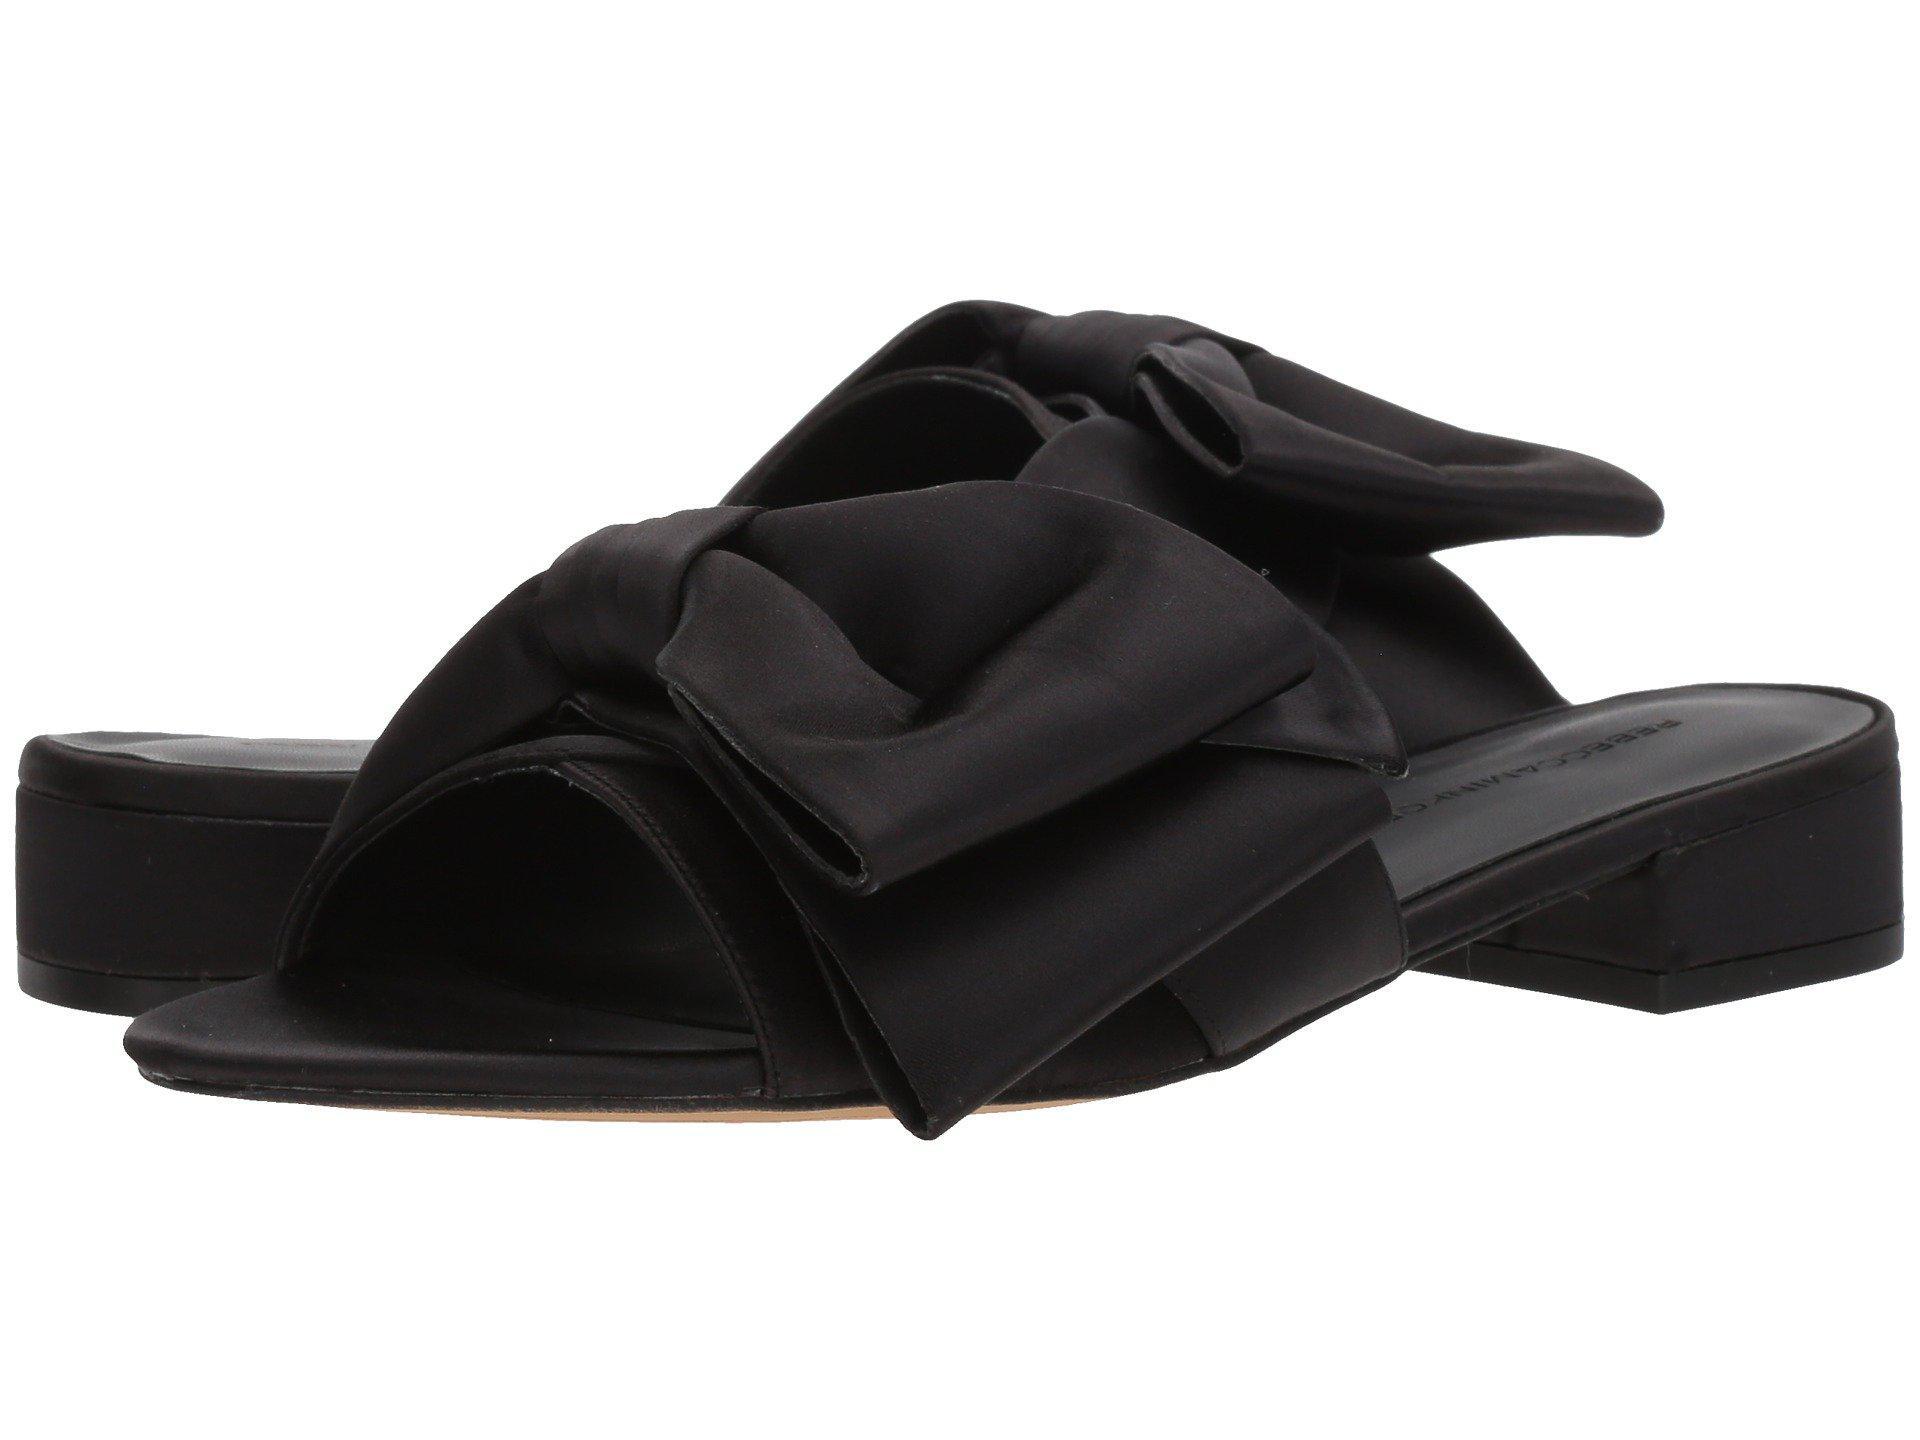 0d8f3c6490cc Lyst - Rebecca Minkoff Calista Slide (black Satin) Women s Slide ...